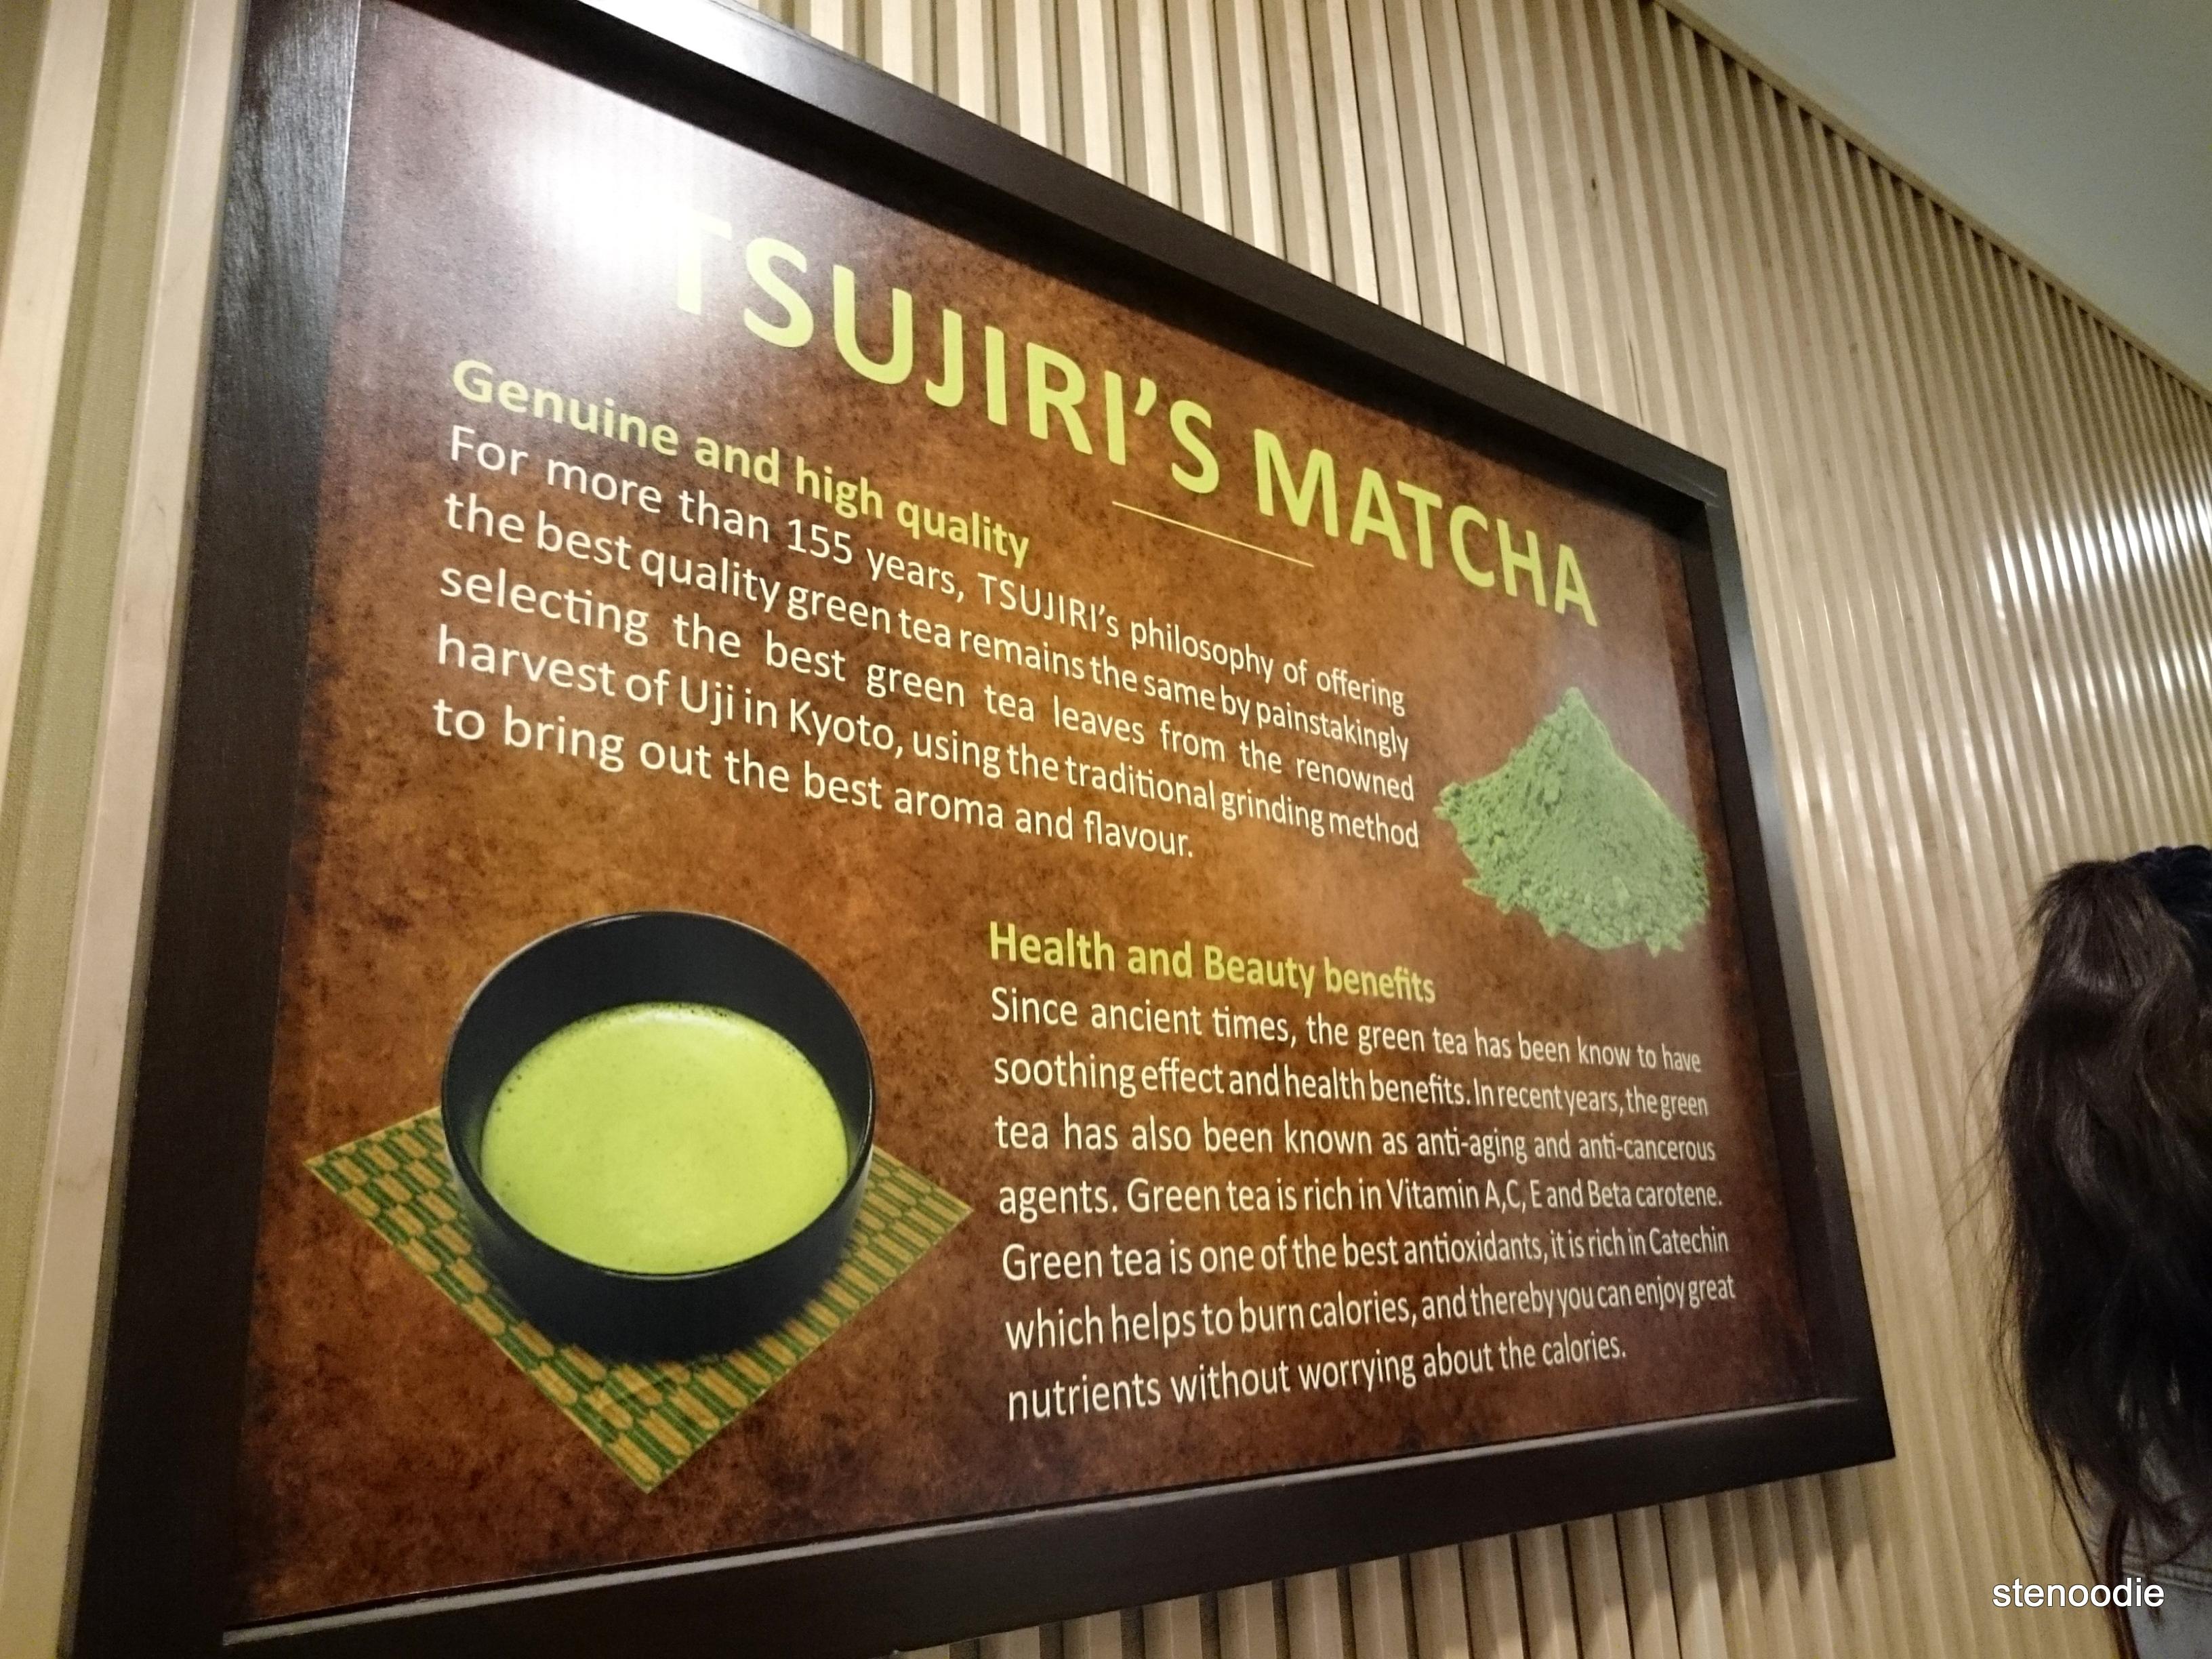 Tsujiri's matcha